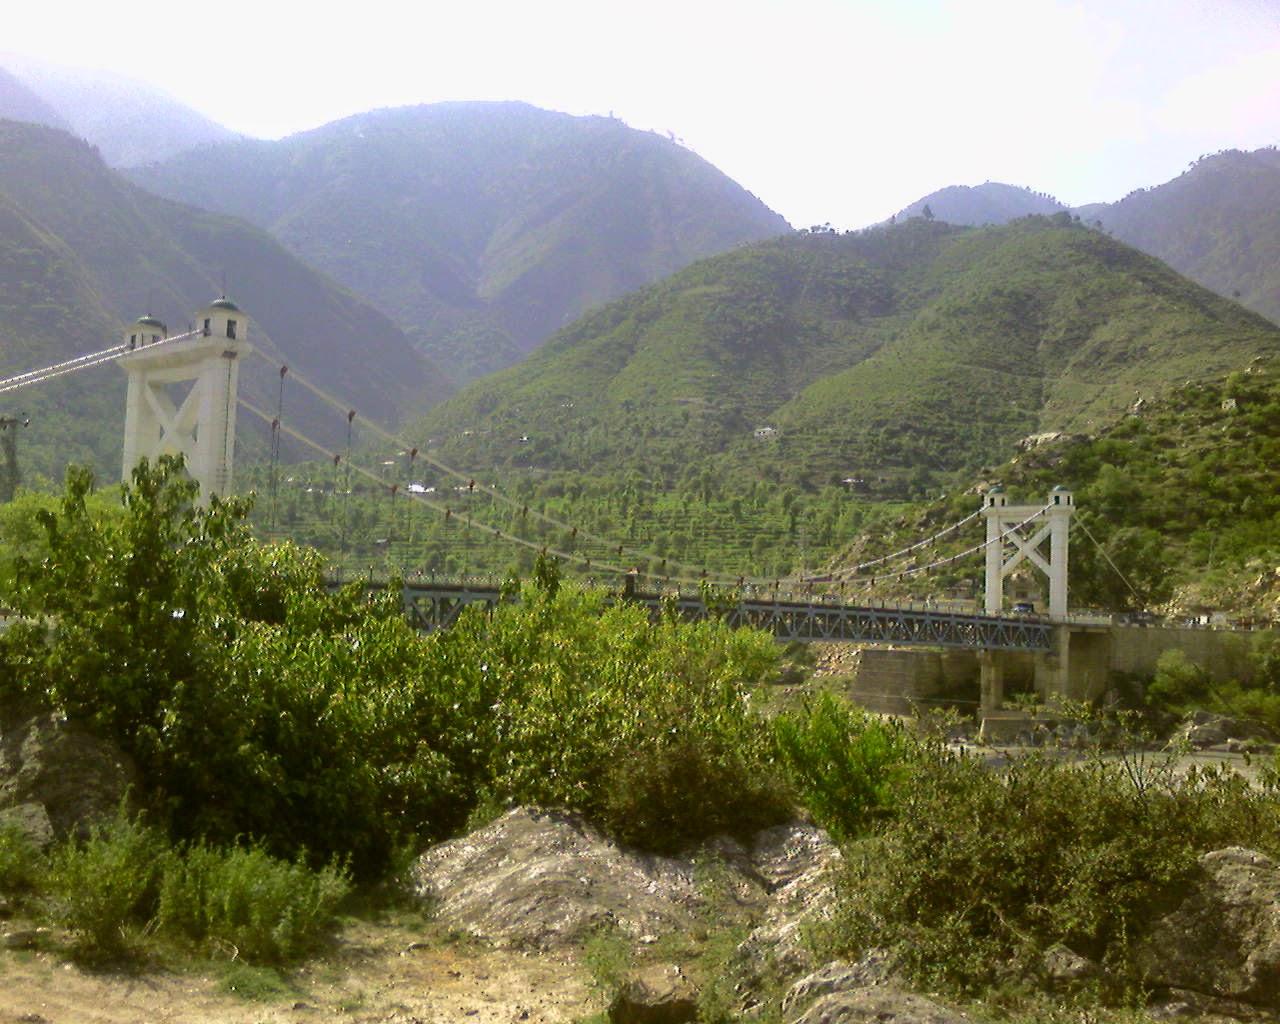 Thakot Bridge